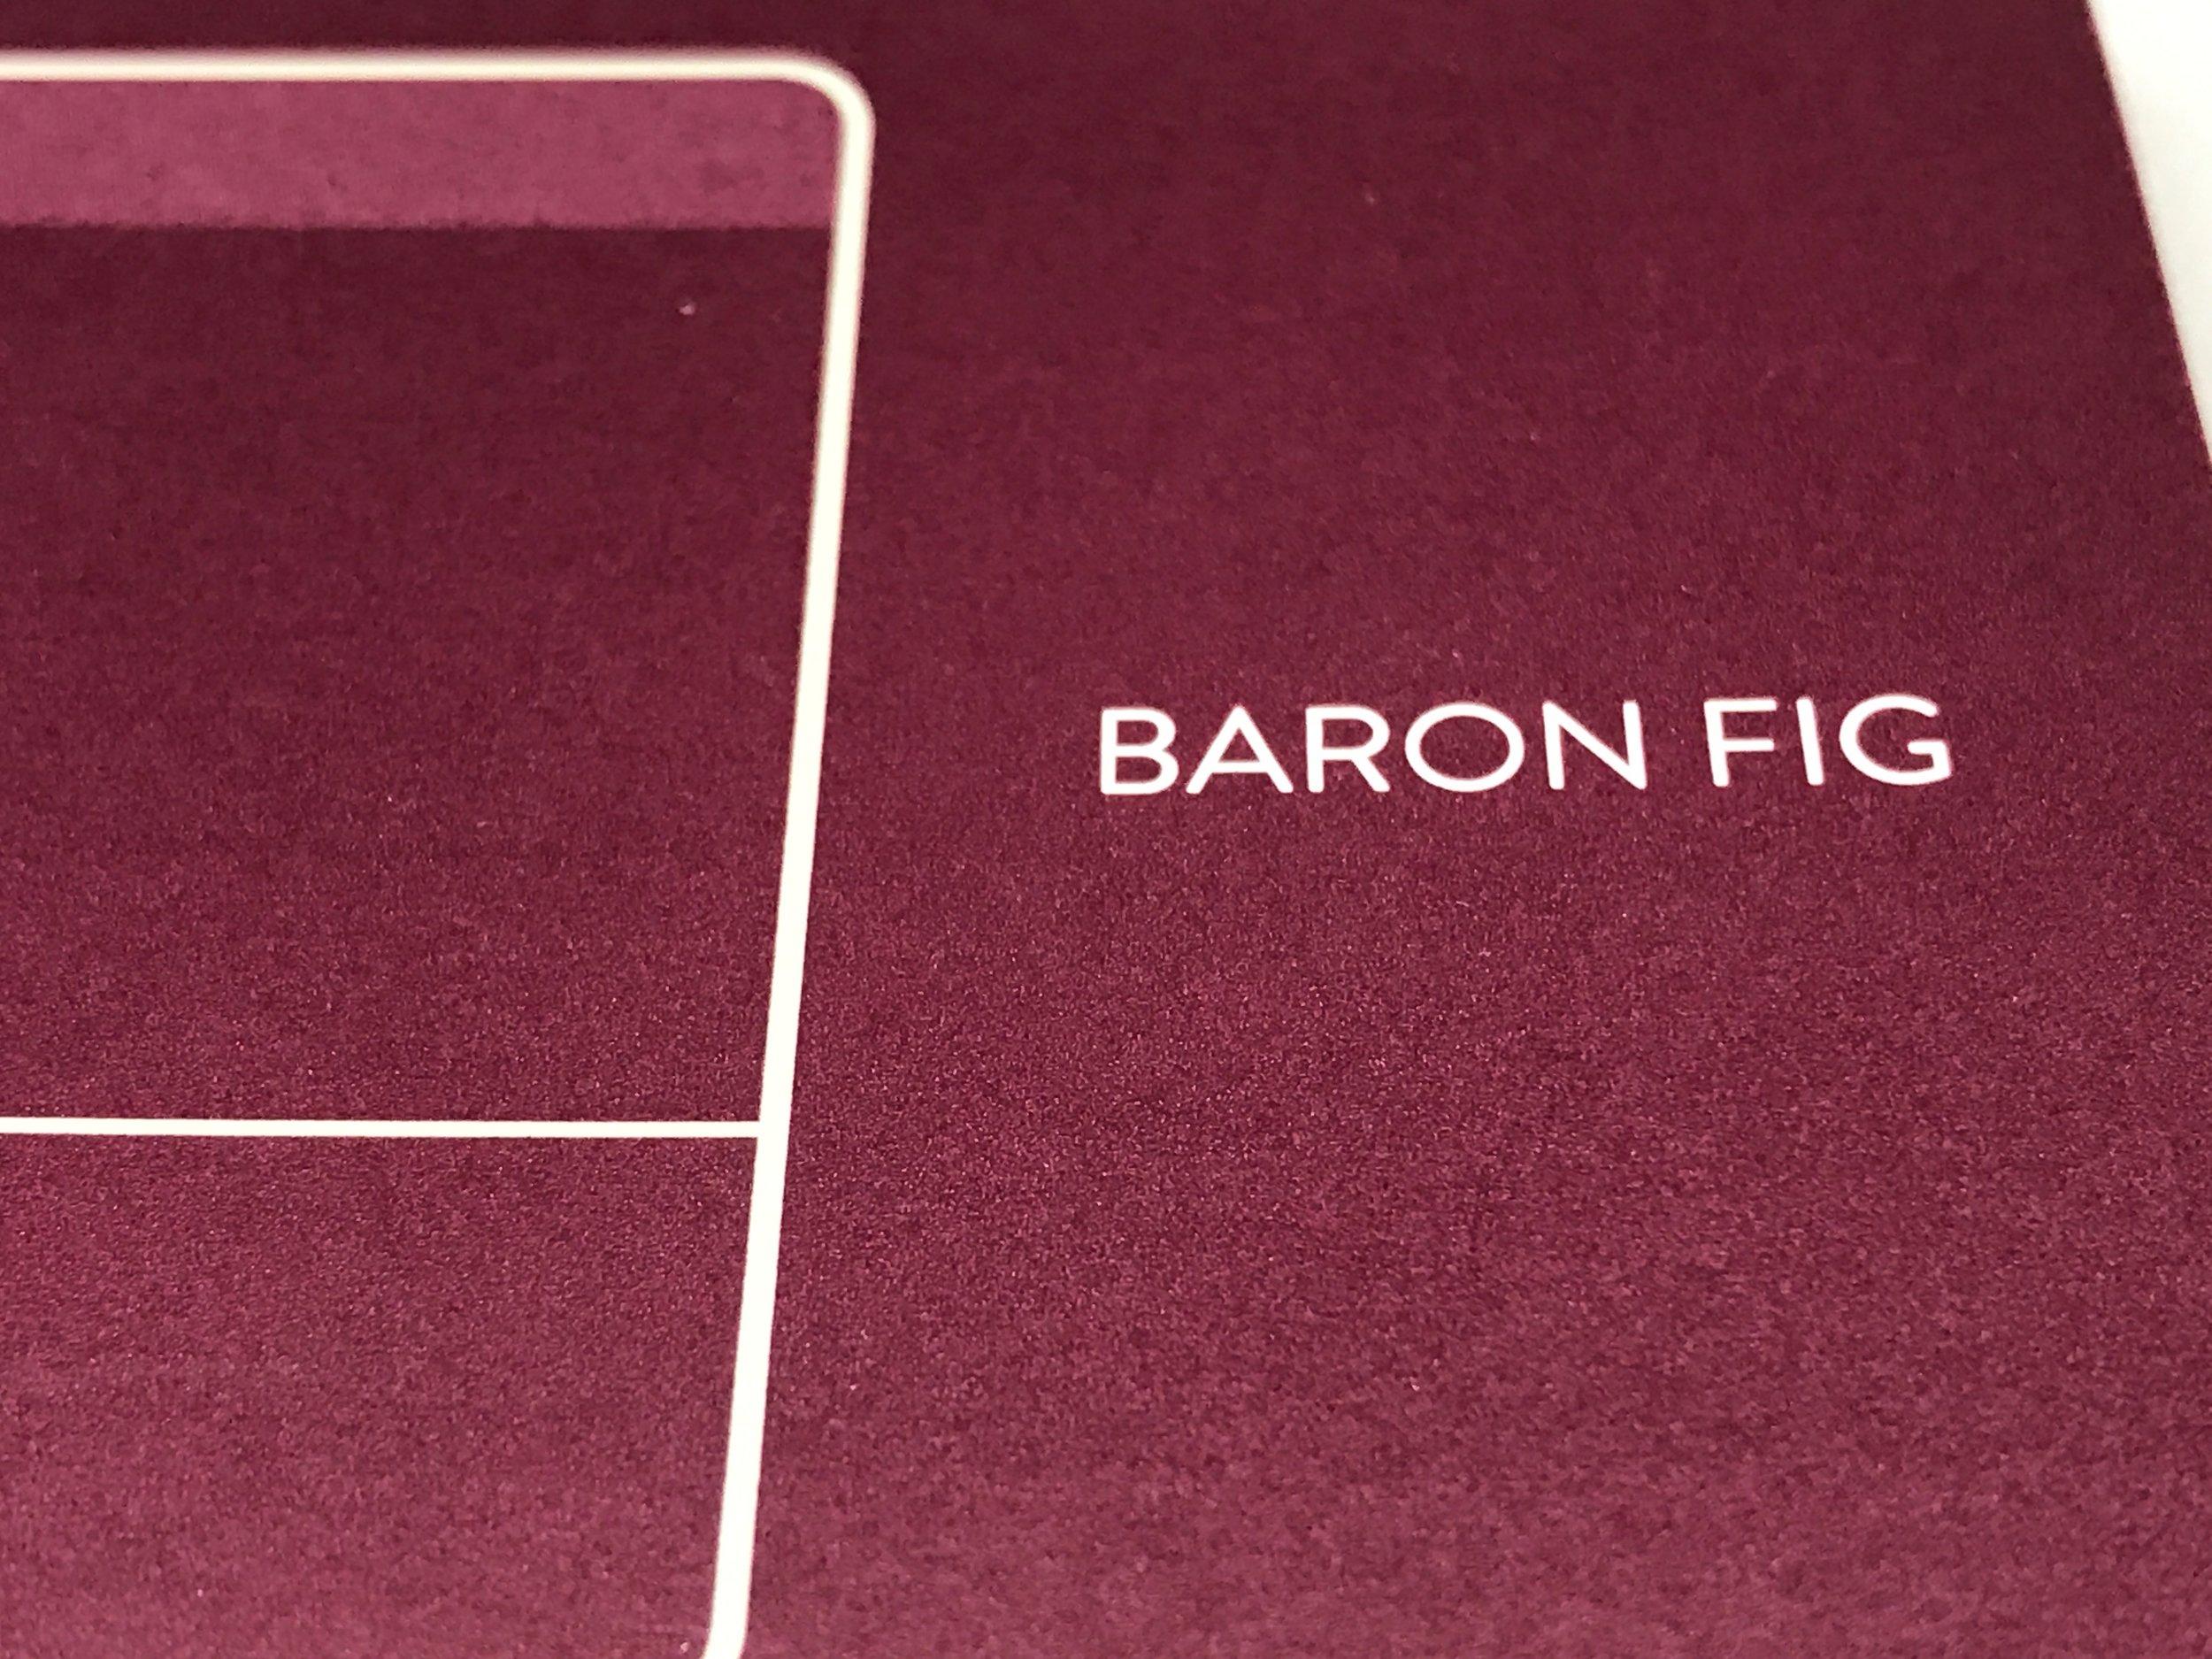 baron-fig-mastermind-week-pad-3.jpg